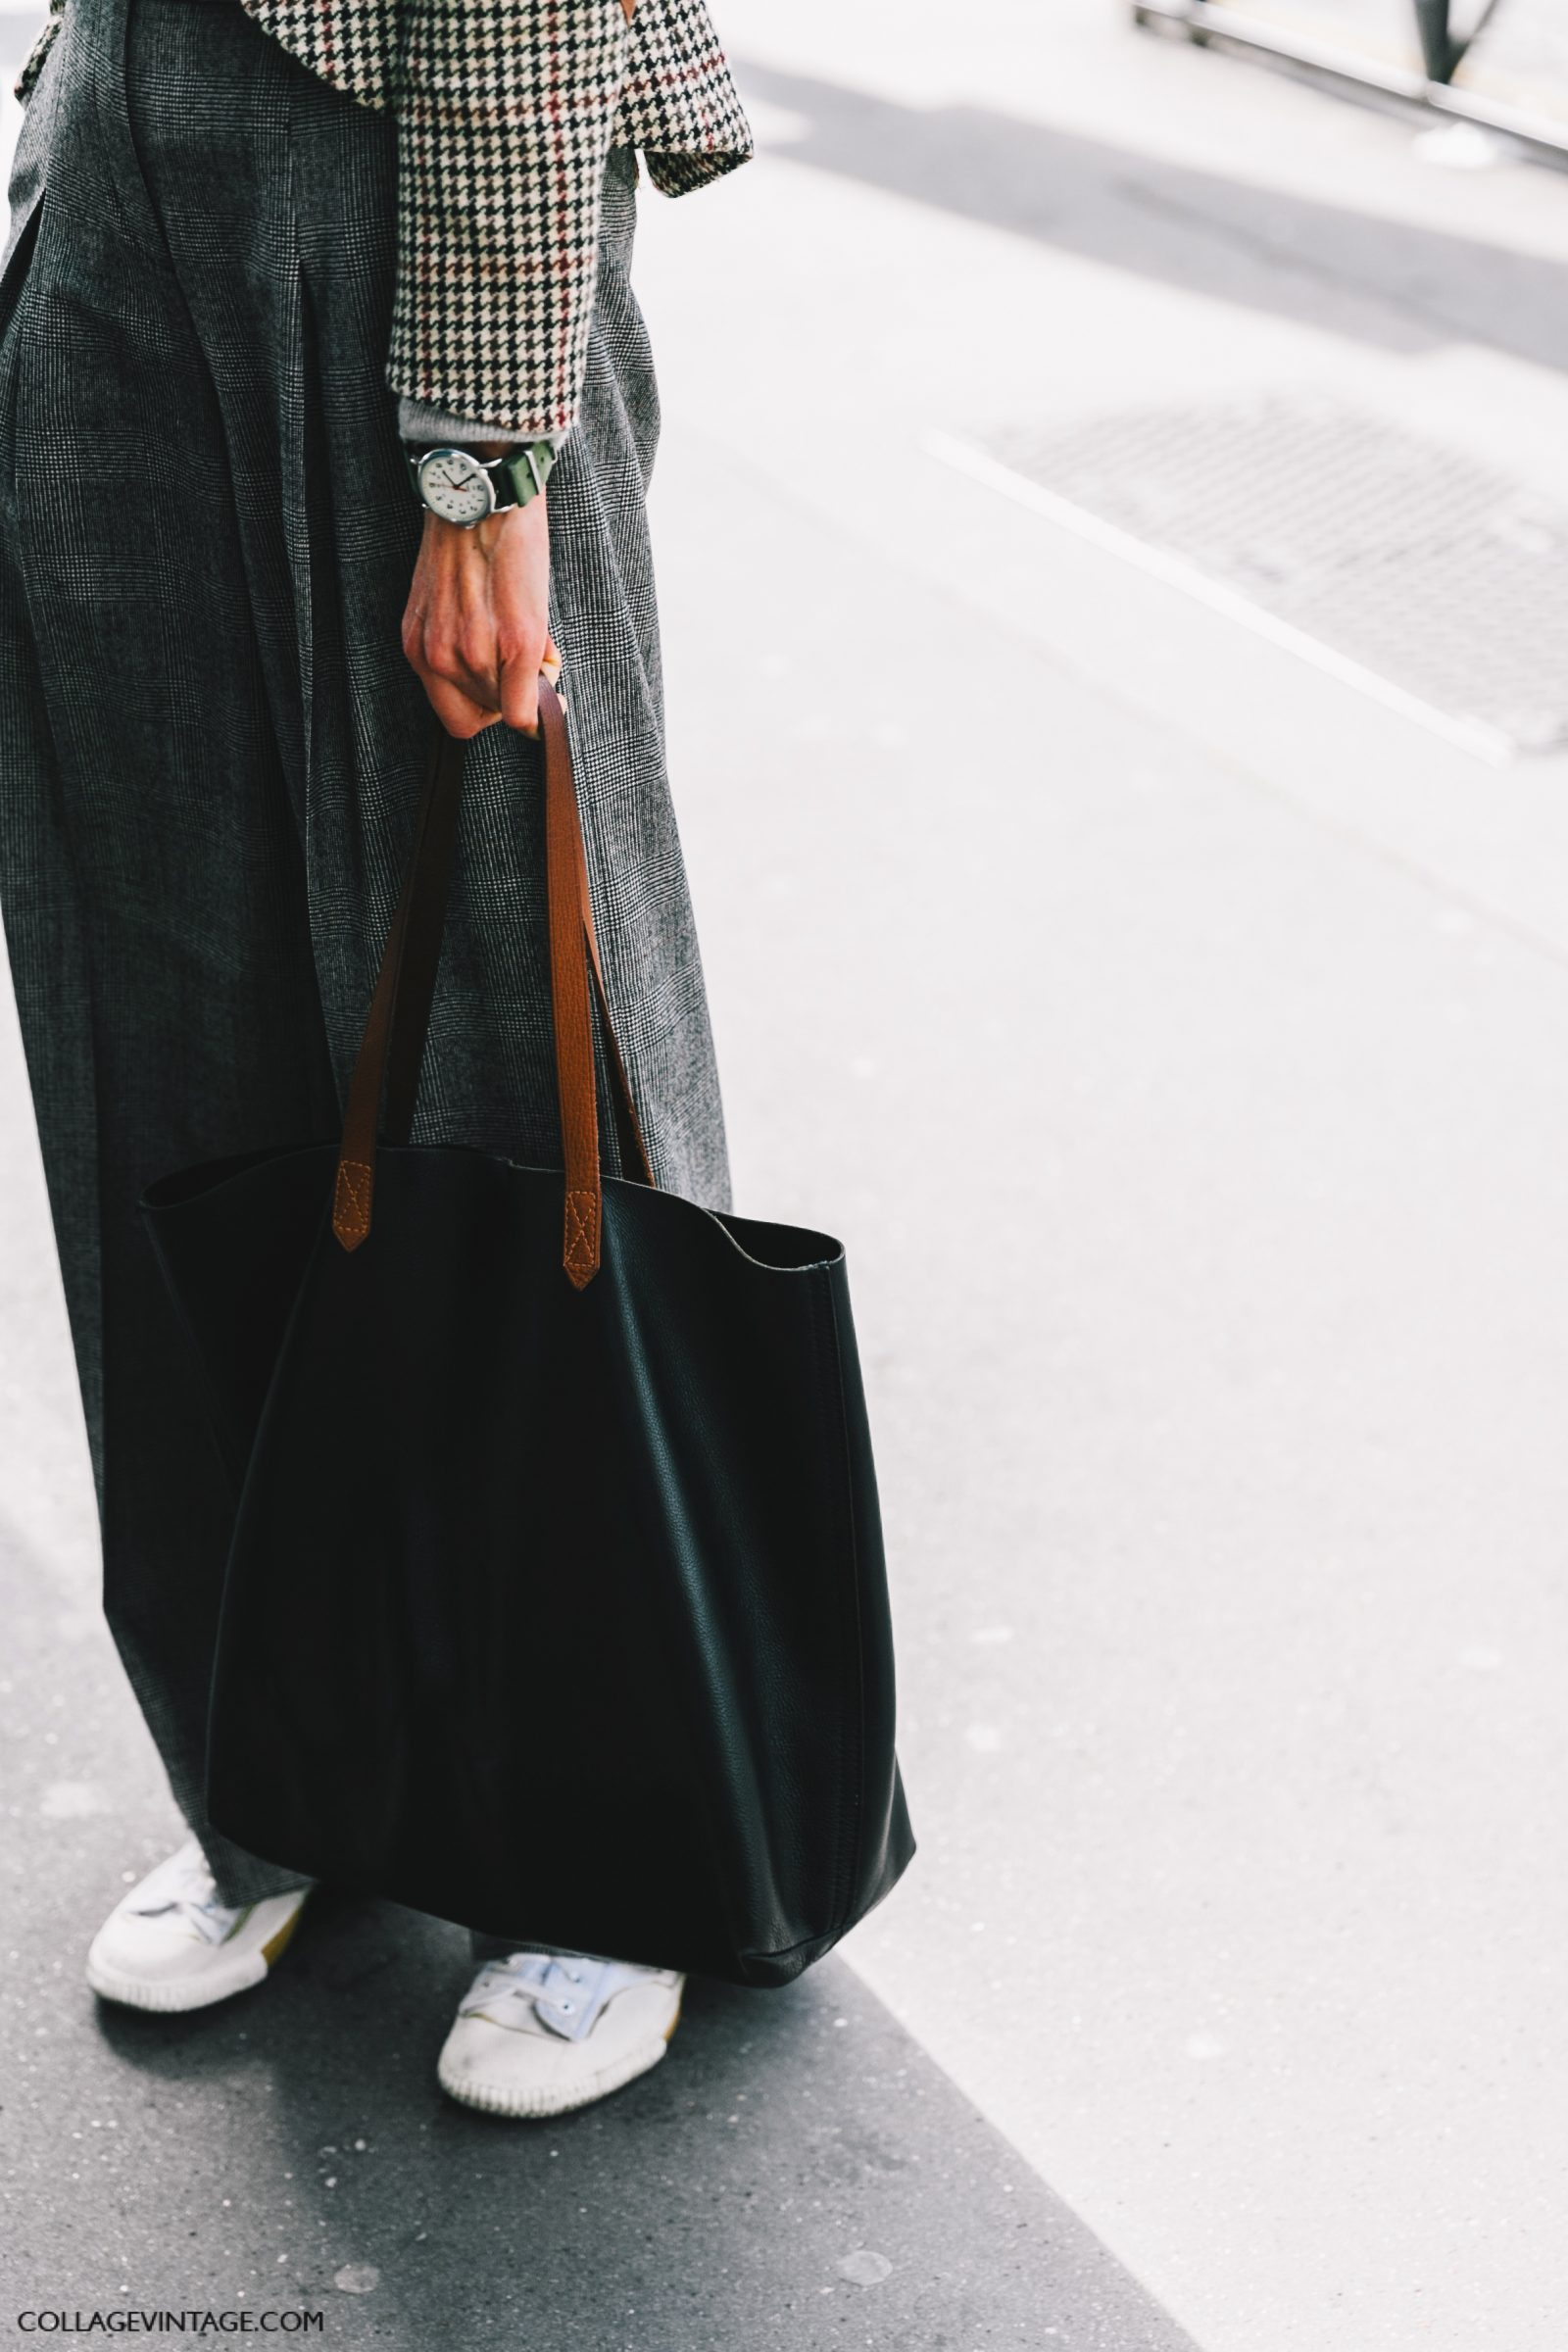 pfw-paris_fashion_week_ss17-street_style-outfits-collage_vintage-valentino-balenciaga-celine-98